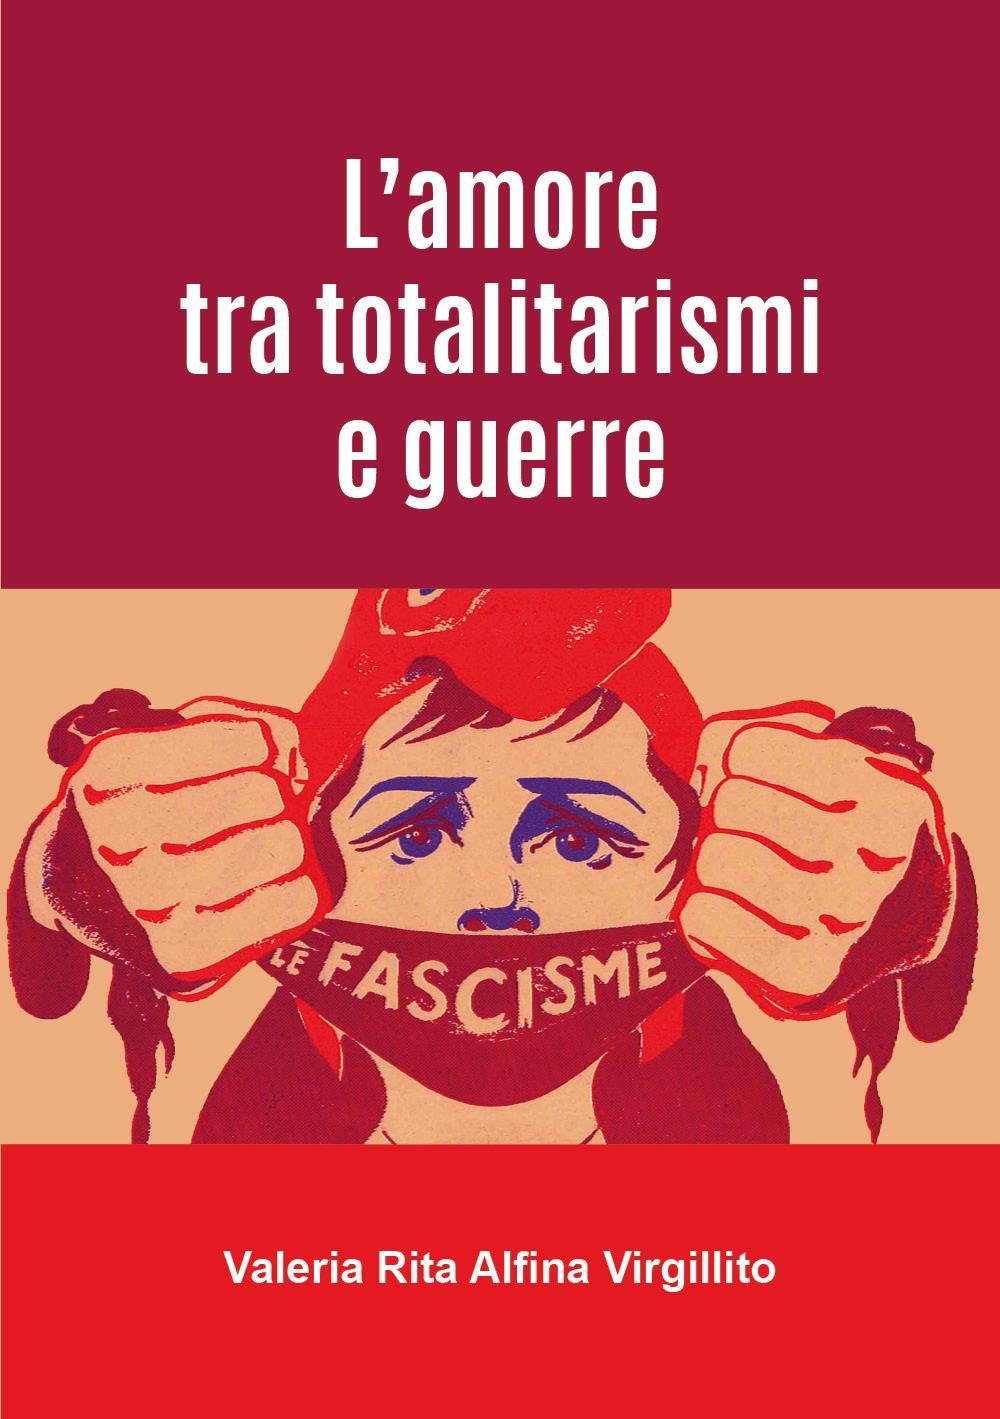 L'amore tra totalitarismi e guerre